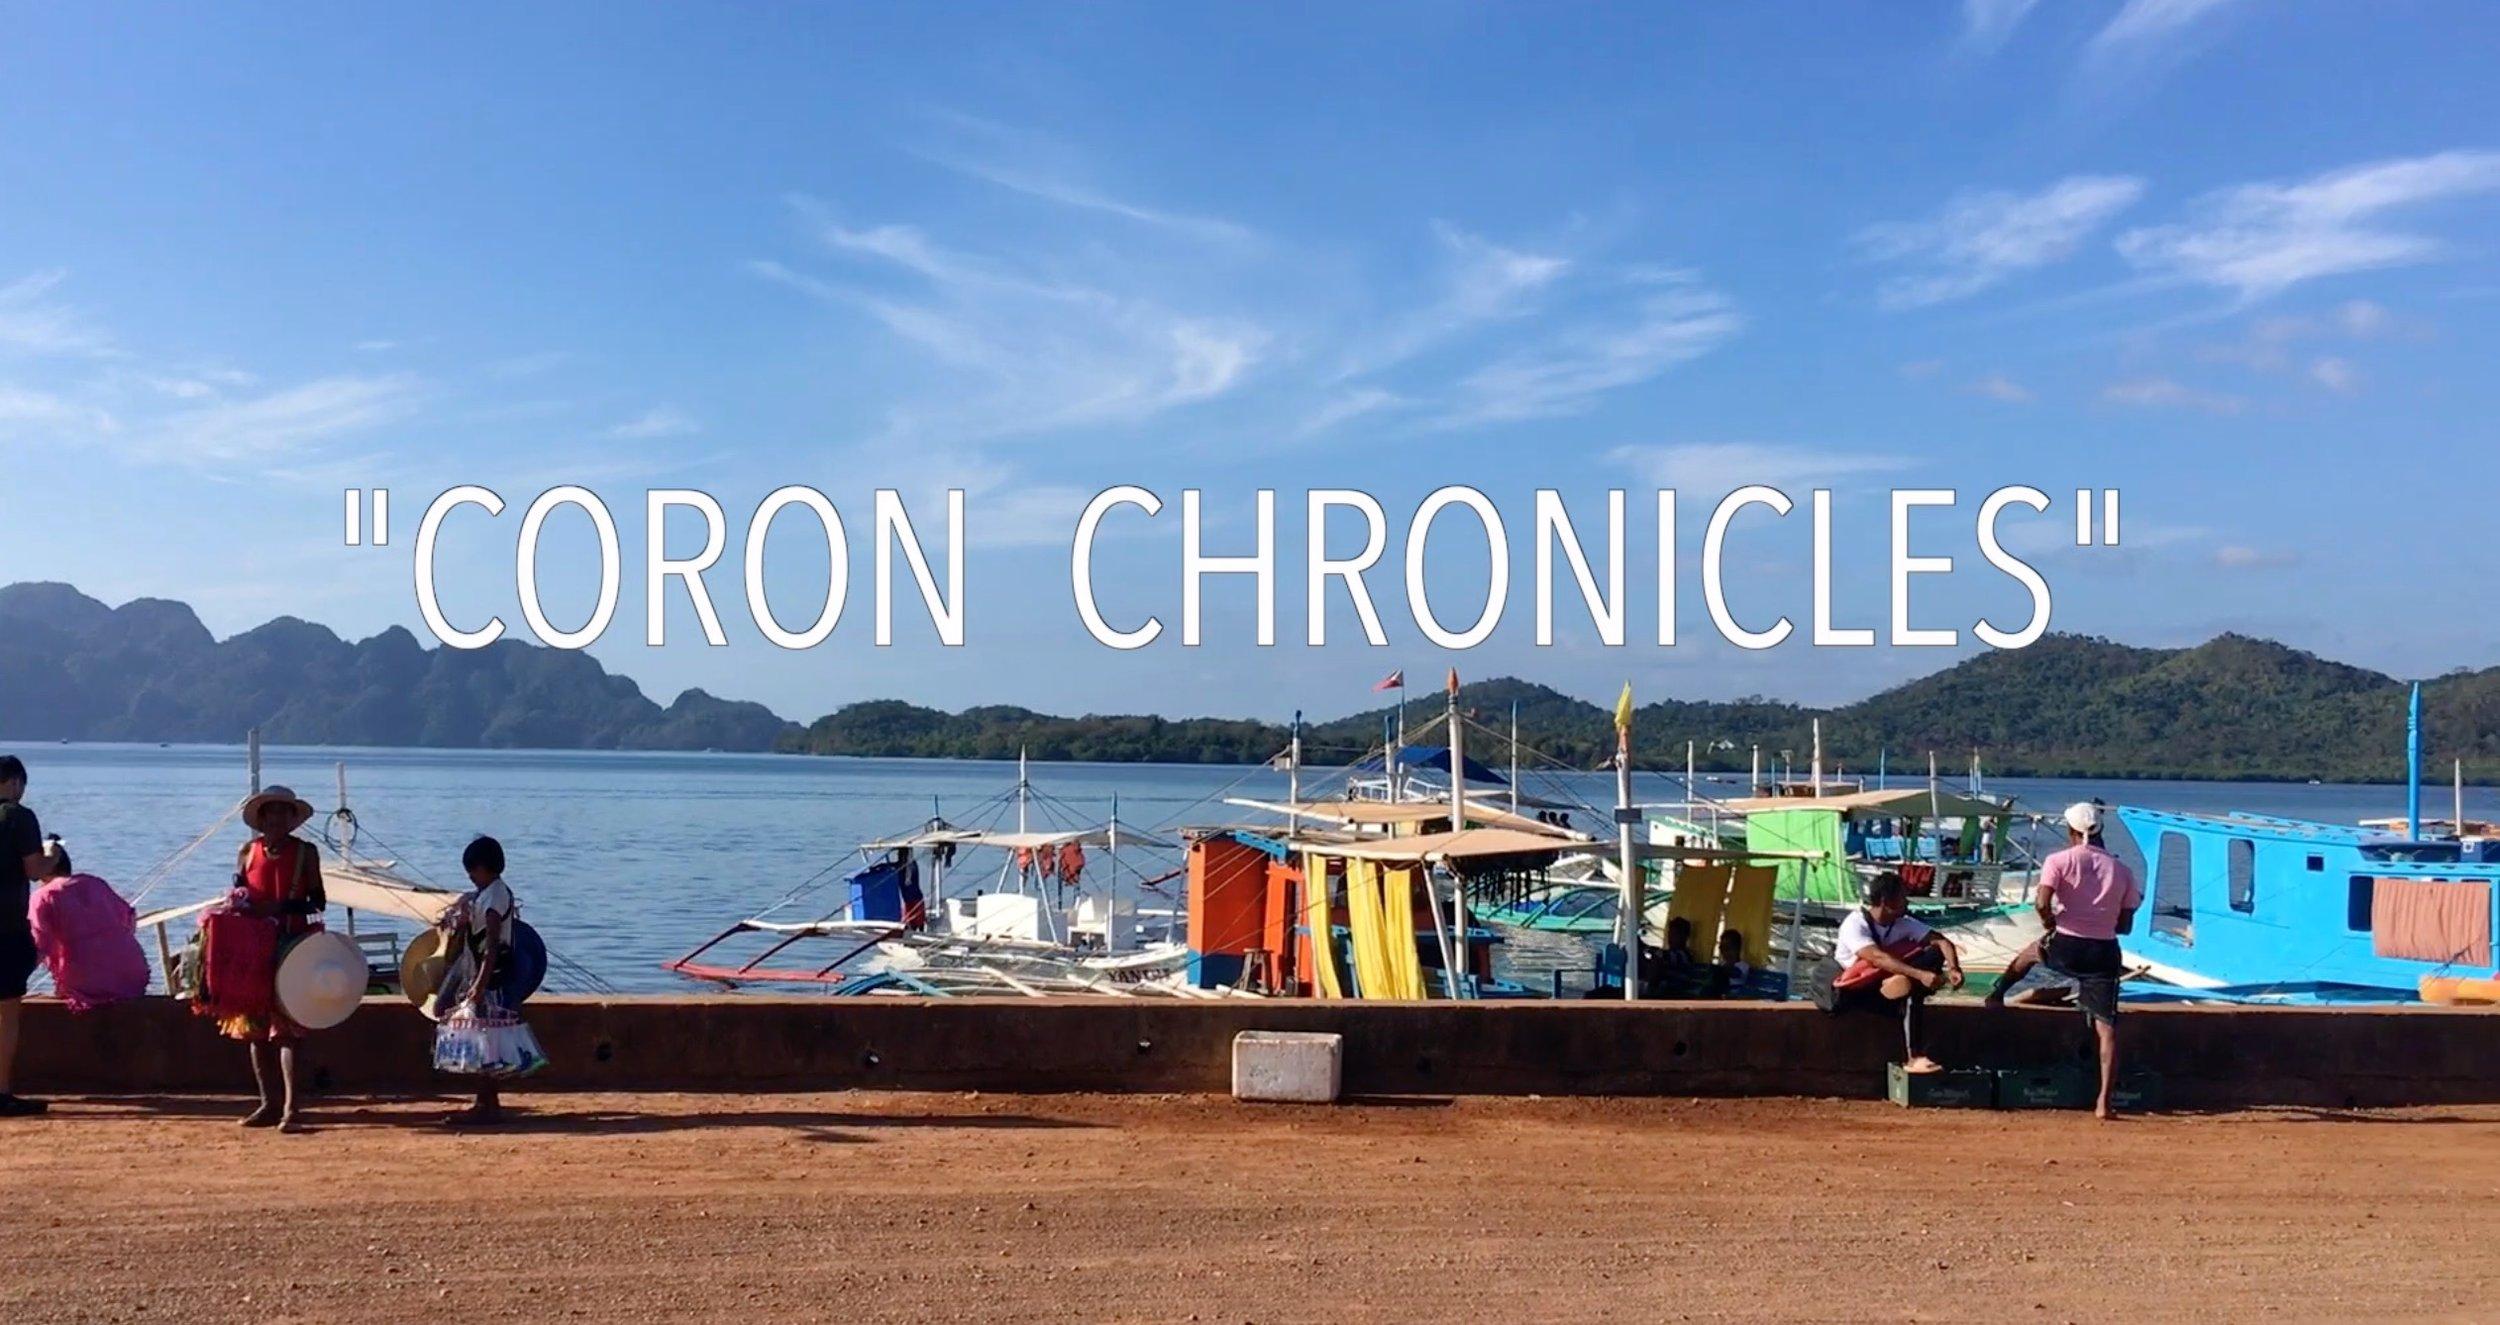 Coron Chronicles copy.jpeg